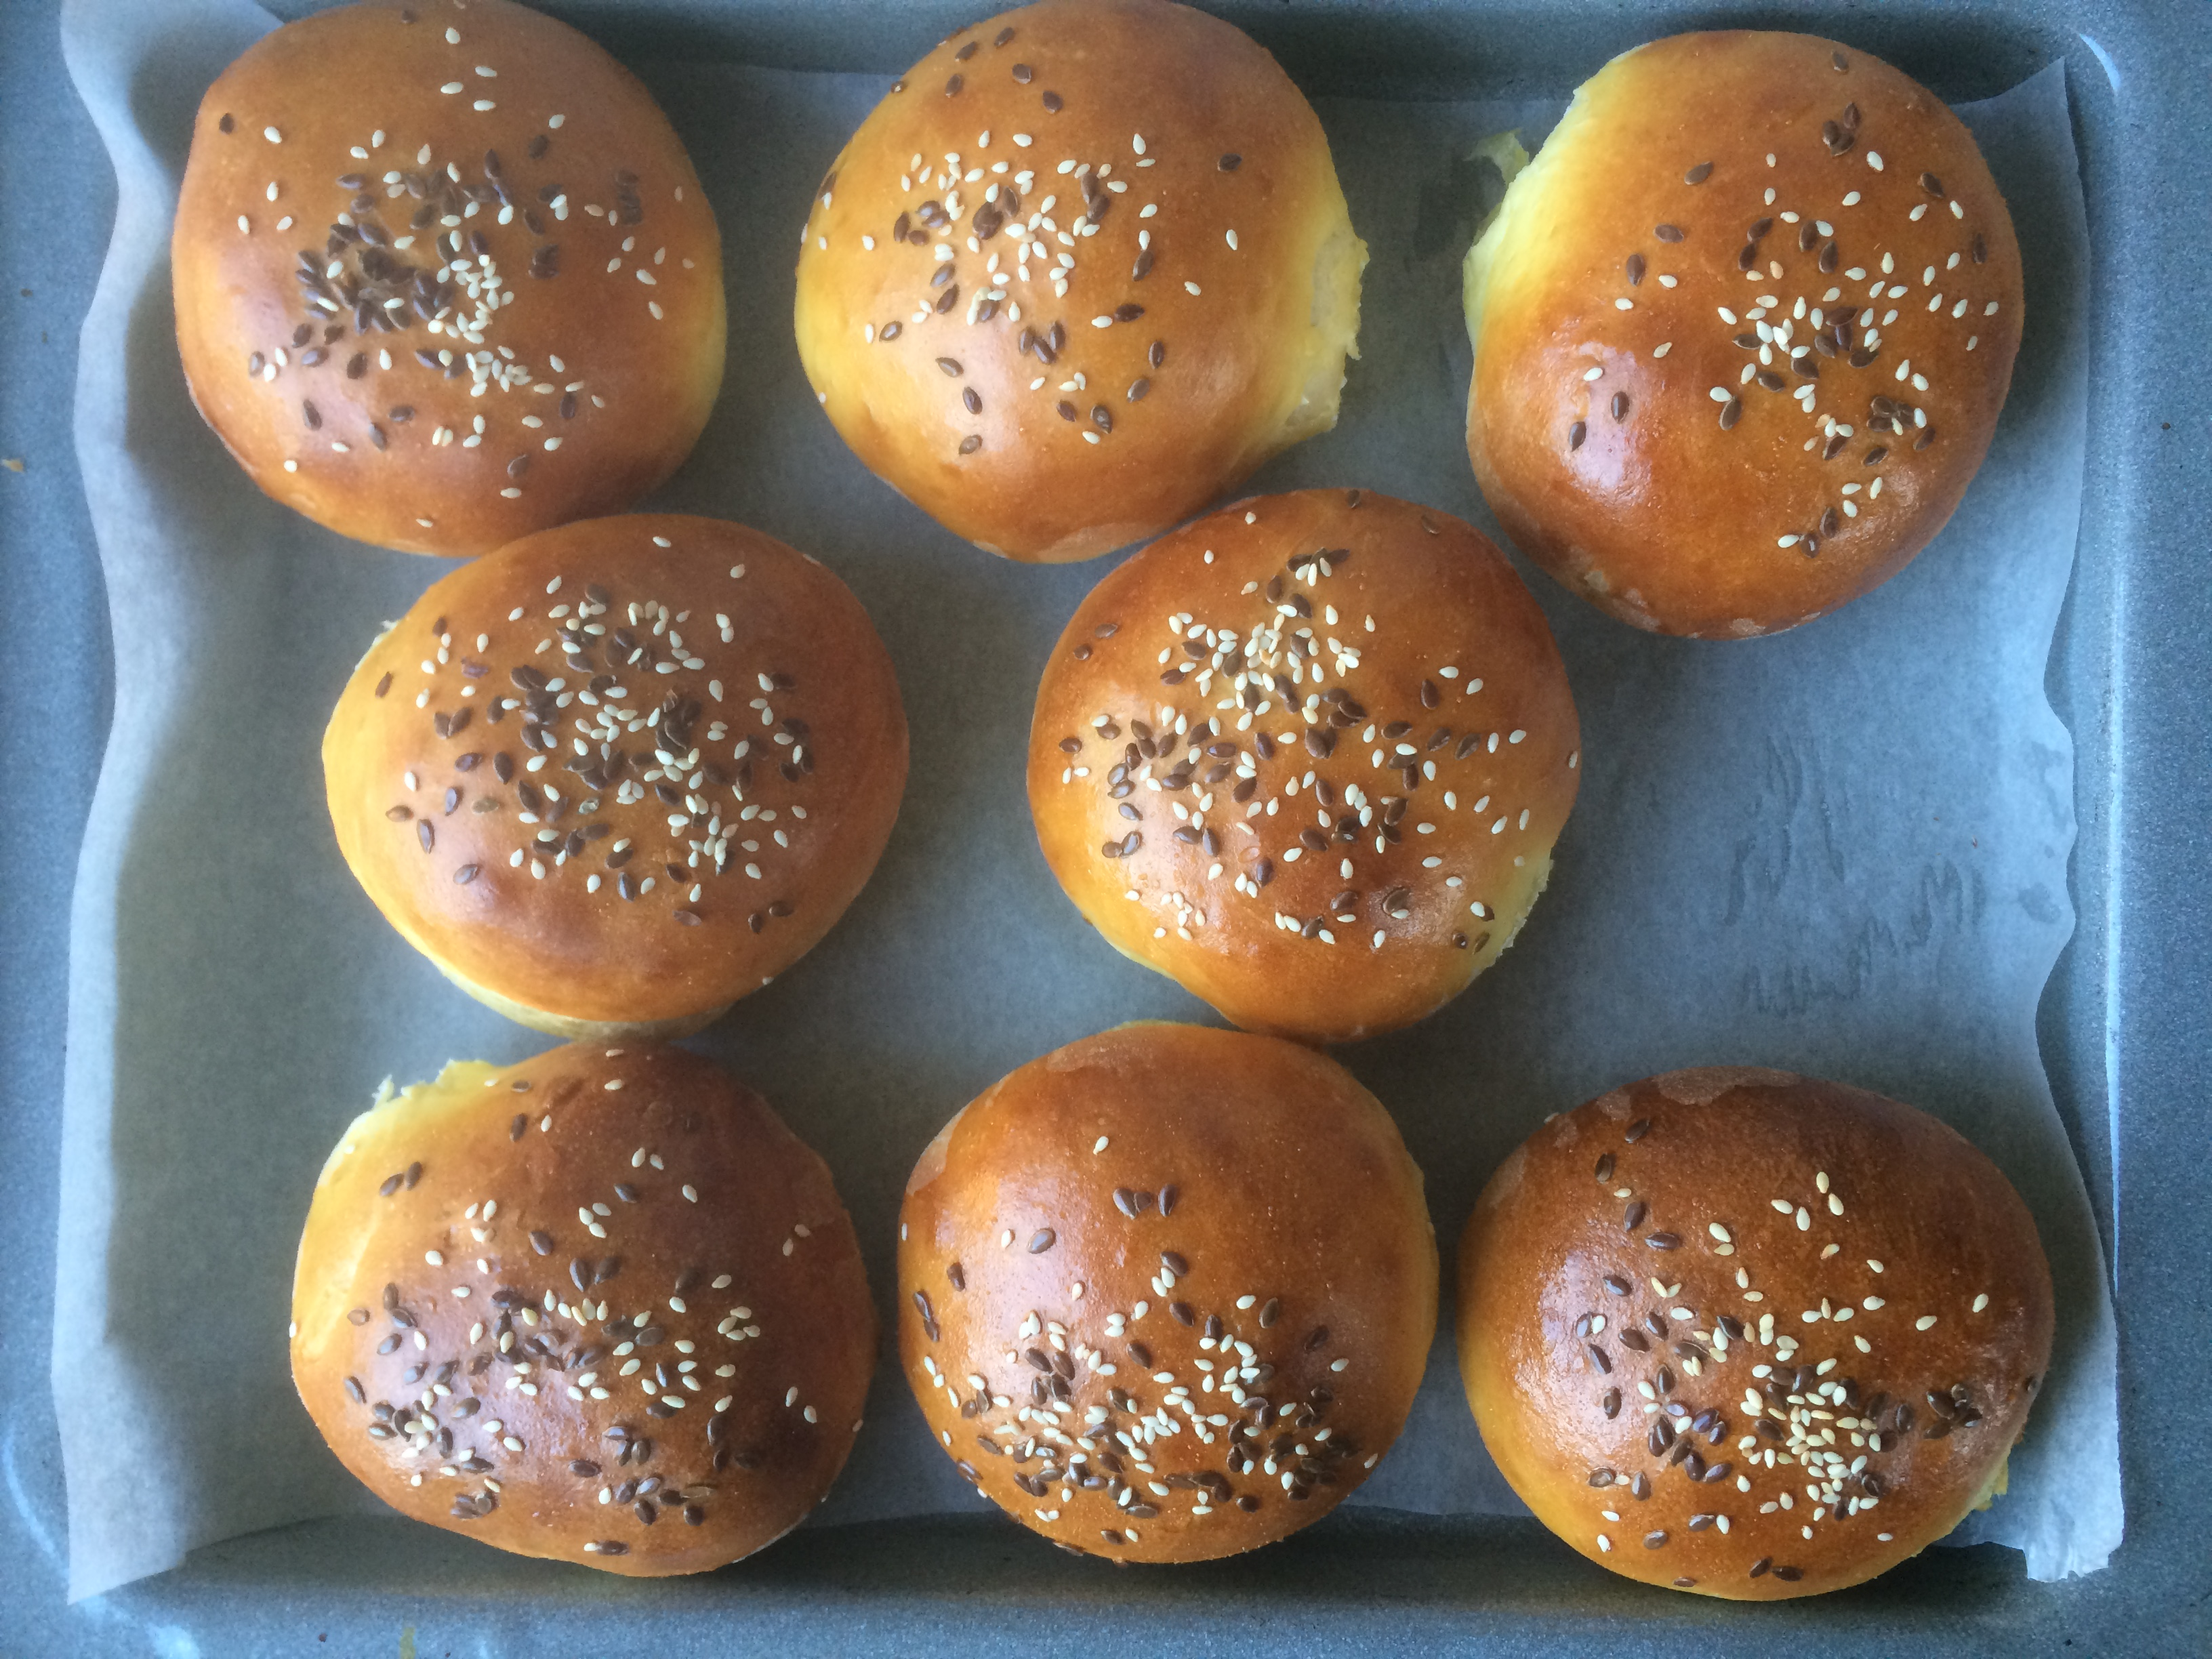 szmk_big_kahuna_burger_diy_recept_recepie_quentin_tarantino_pulp_fiction_csinald_magad_ponyvaregeny_jules_vincent_mia_wallace_zed_tasty_burger_royal_with_cheese_2.JPG